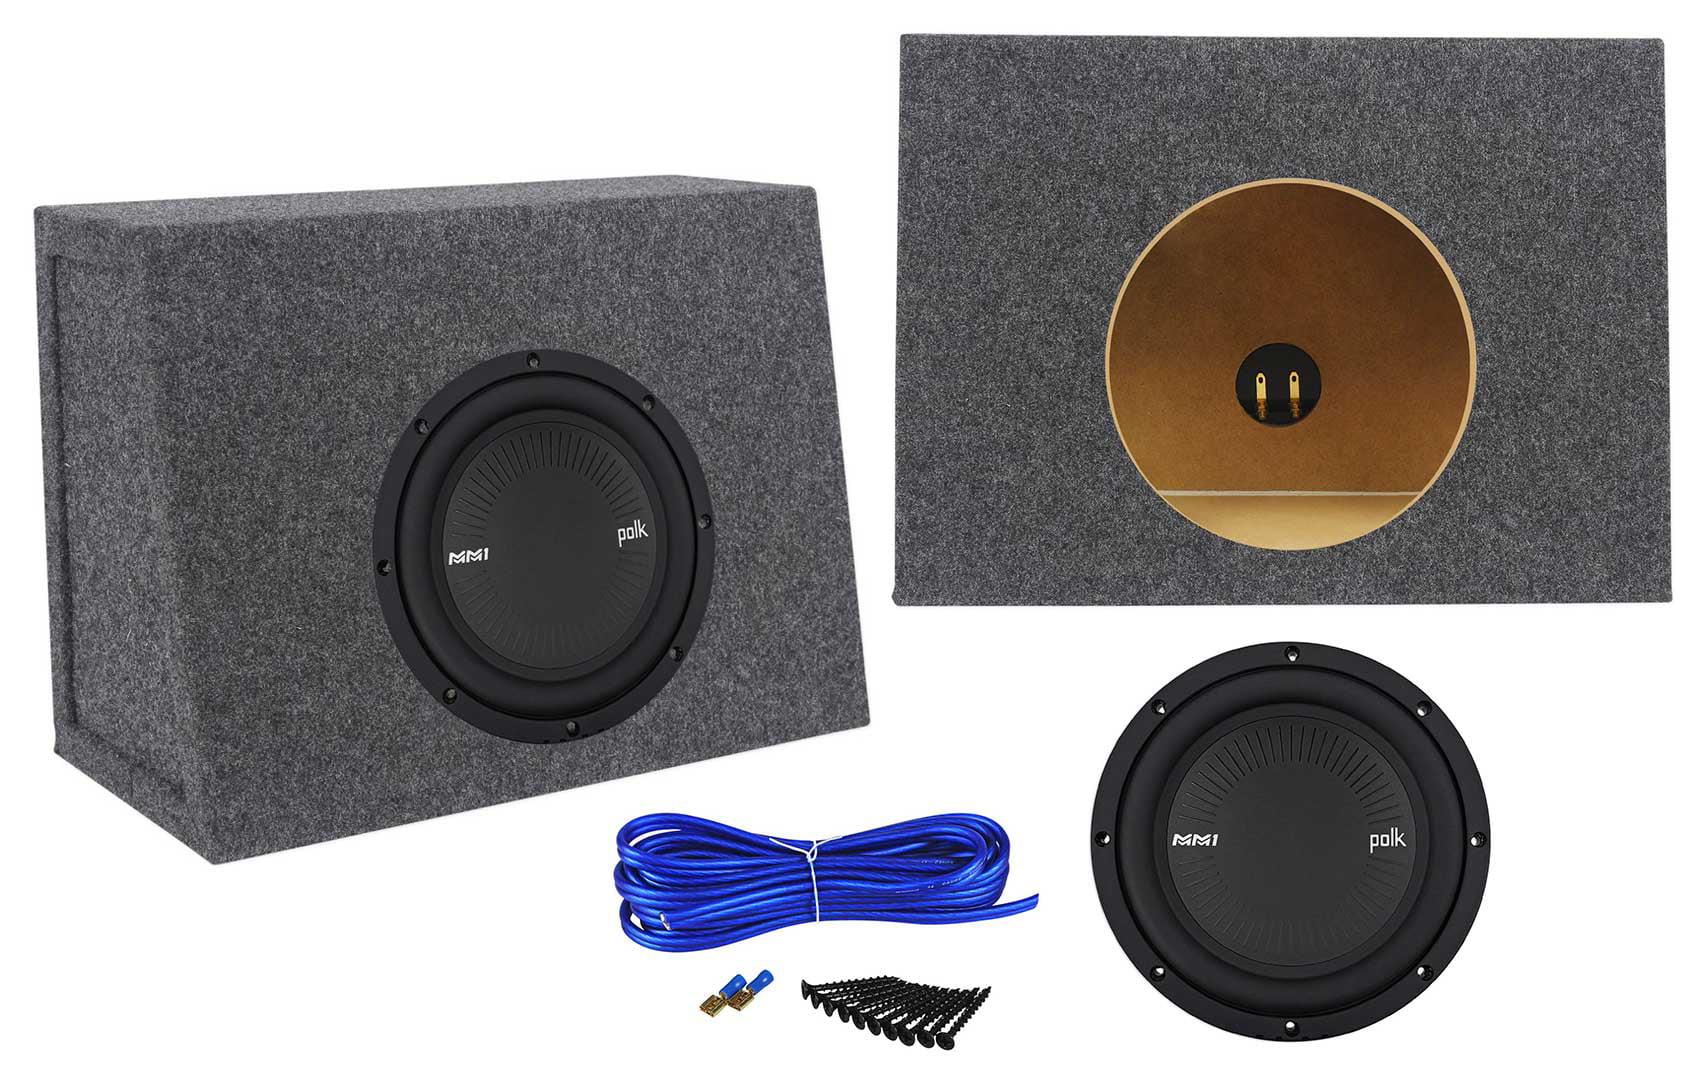 Polk Audio Mm842dvc 8 900w Dvc Car Subwoofer Sub Sealed Wiring Kits Box Enclosure